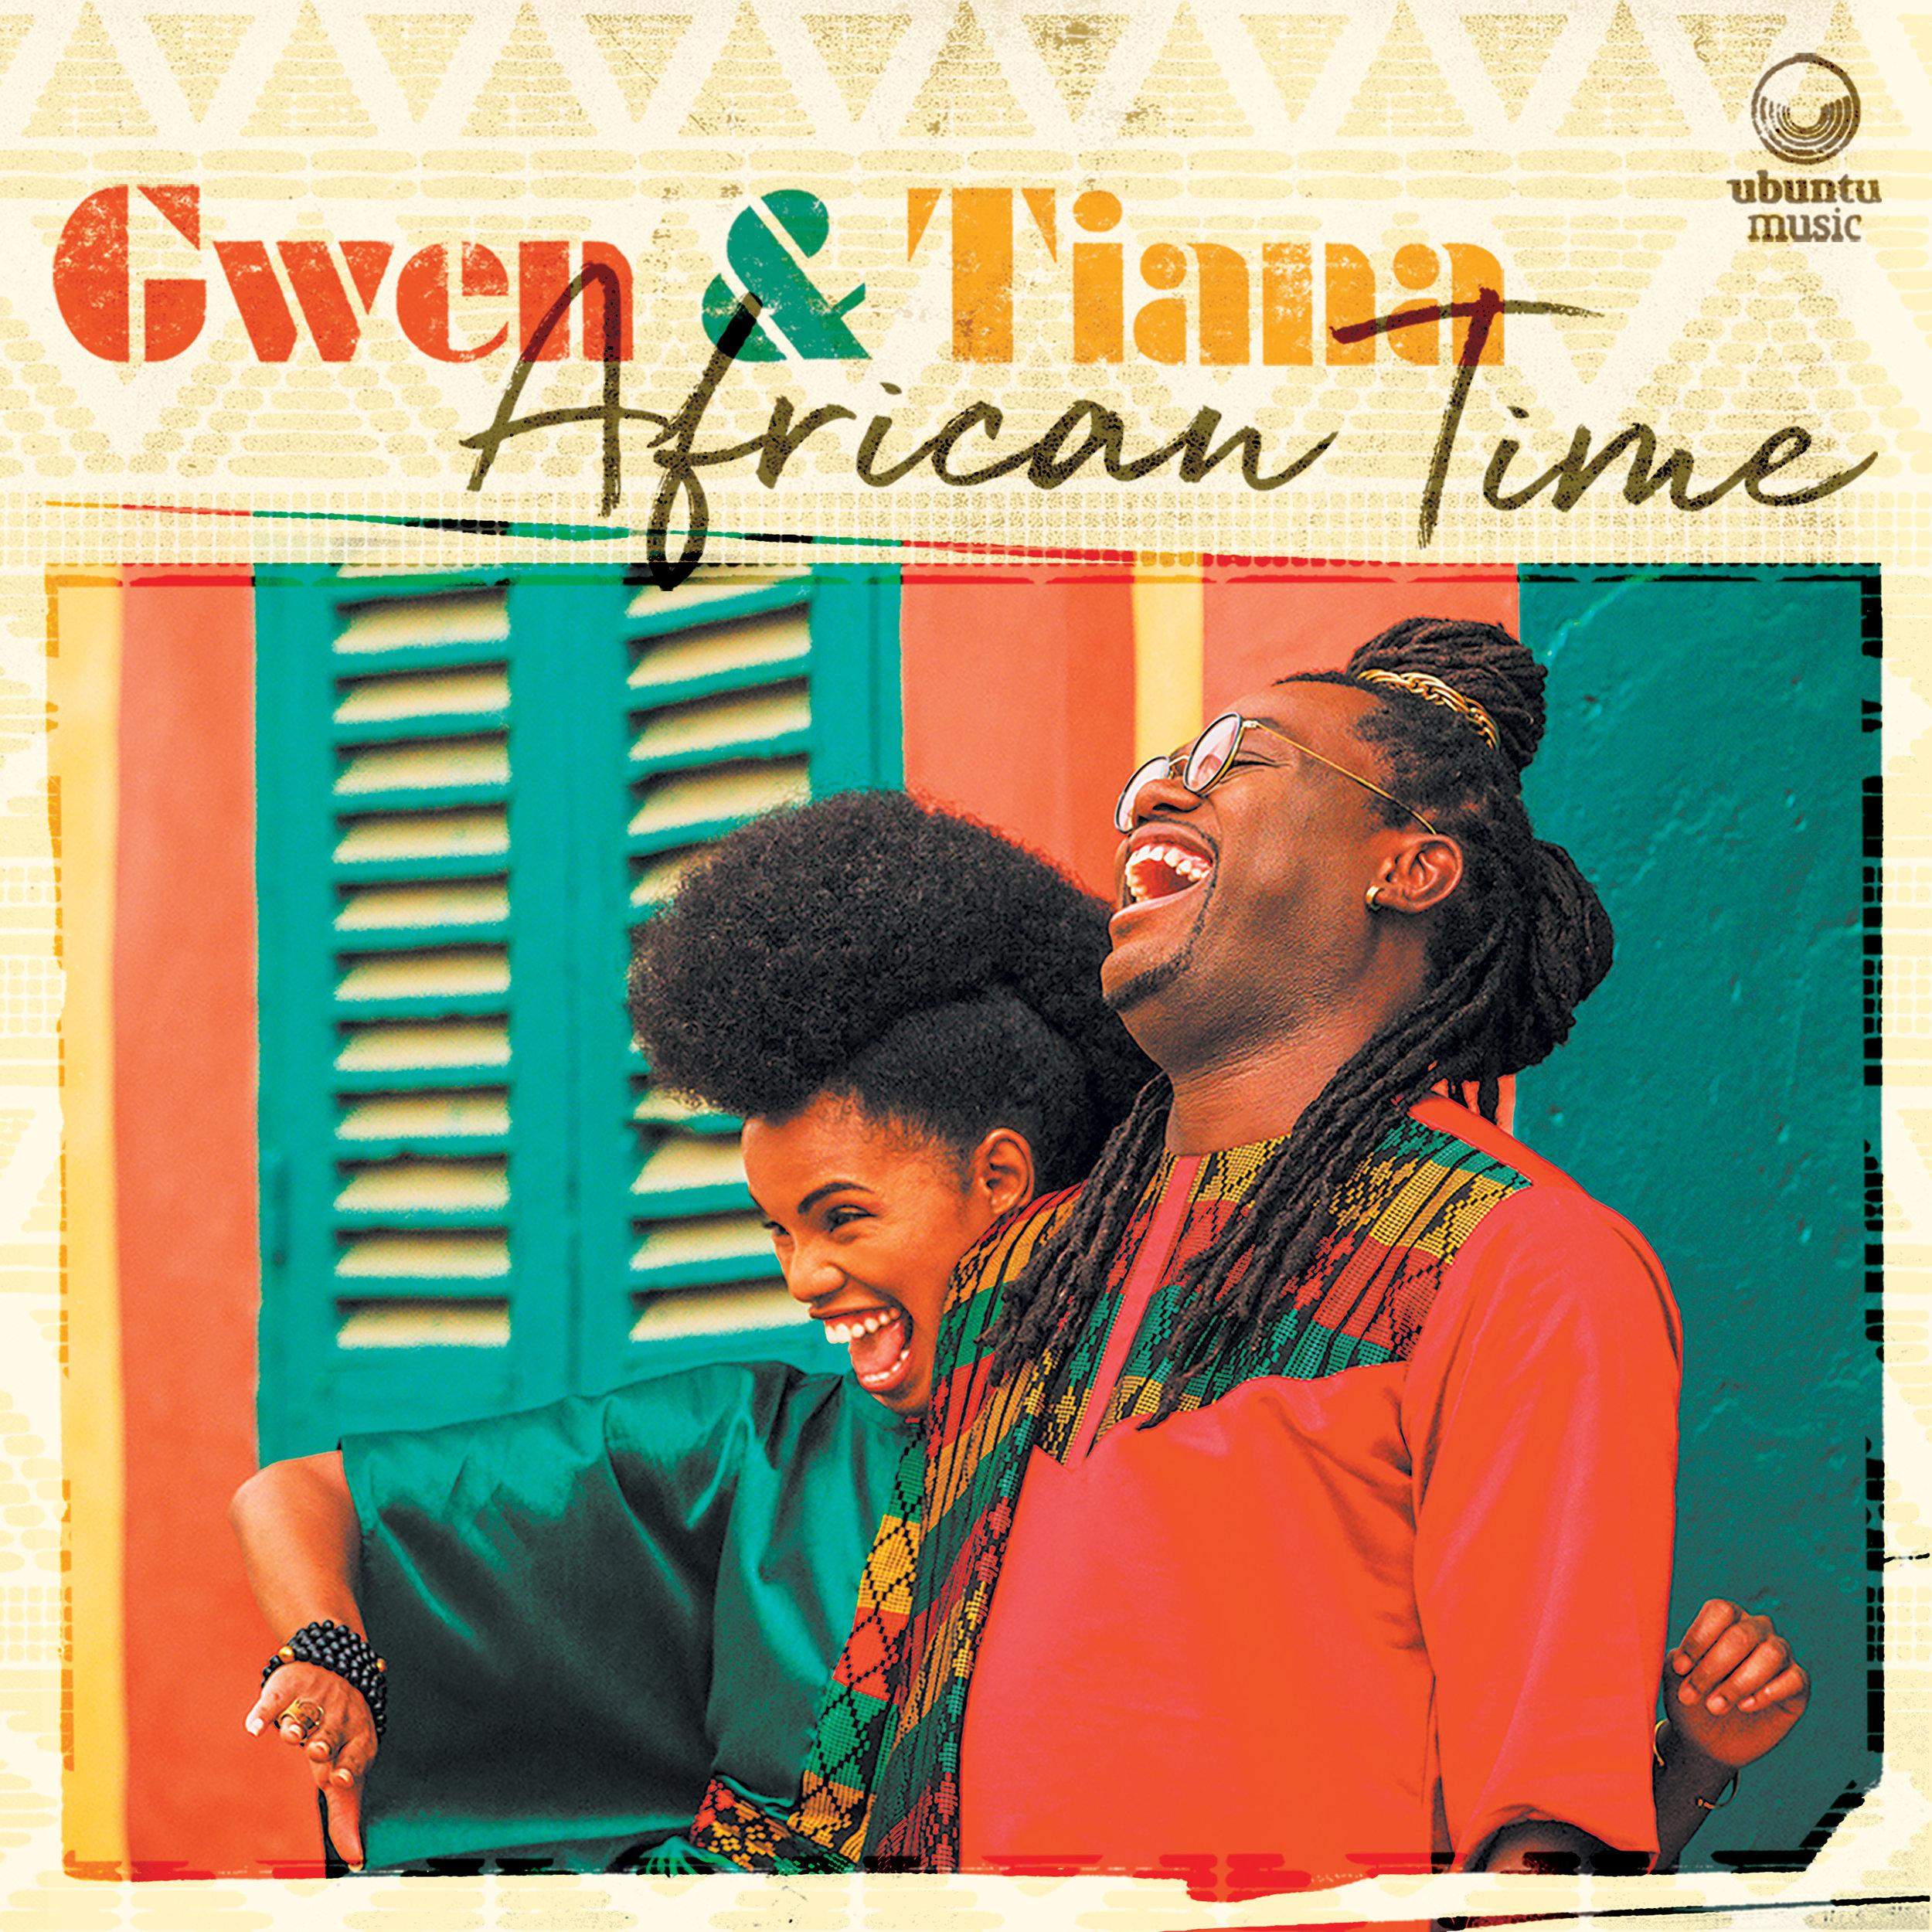 UBU0022_G&T_African Time_3000x3000_cov.jpg